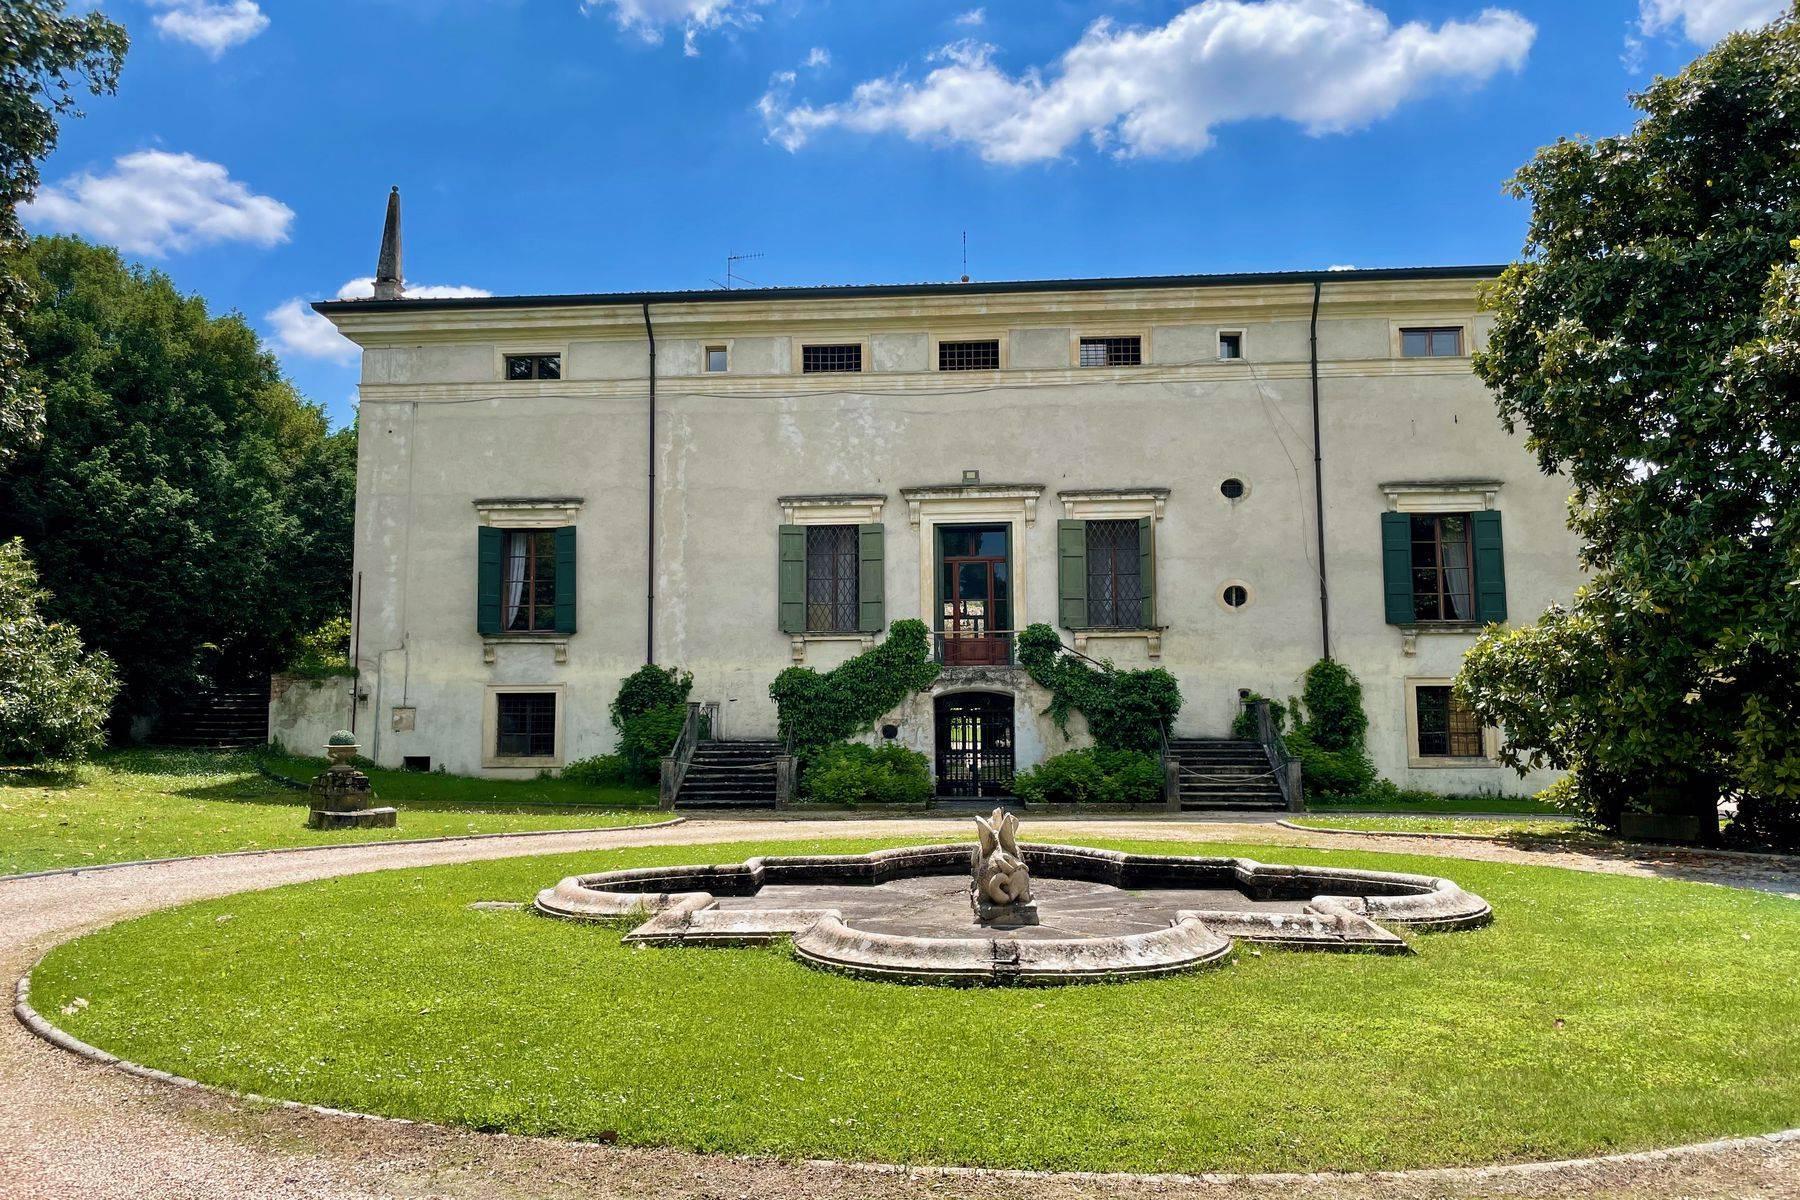 Affascinante villa Veneta a pochi minuti da Verona - 35